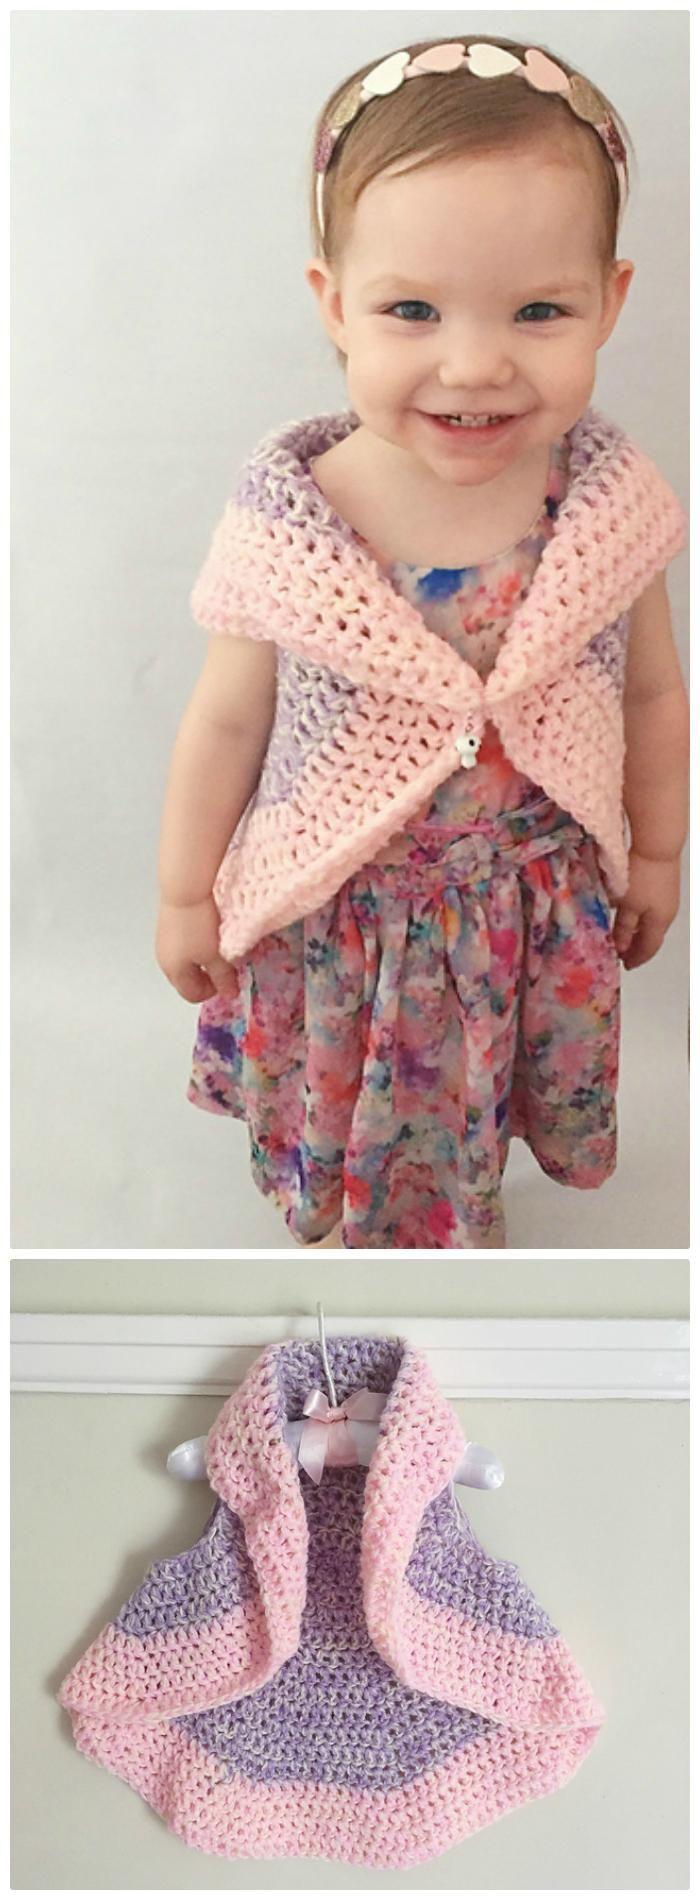 Crochet Bella Circle Waistcoat – Free Crochet Pattern for Baby - Crochet Circular Vest / Jacket 10 FREE Crochet Patterns - DIY & Crafts